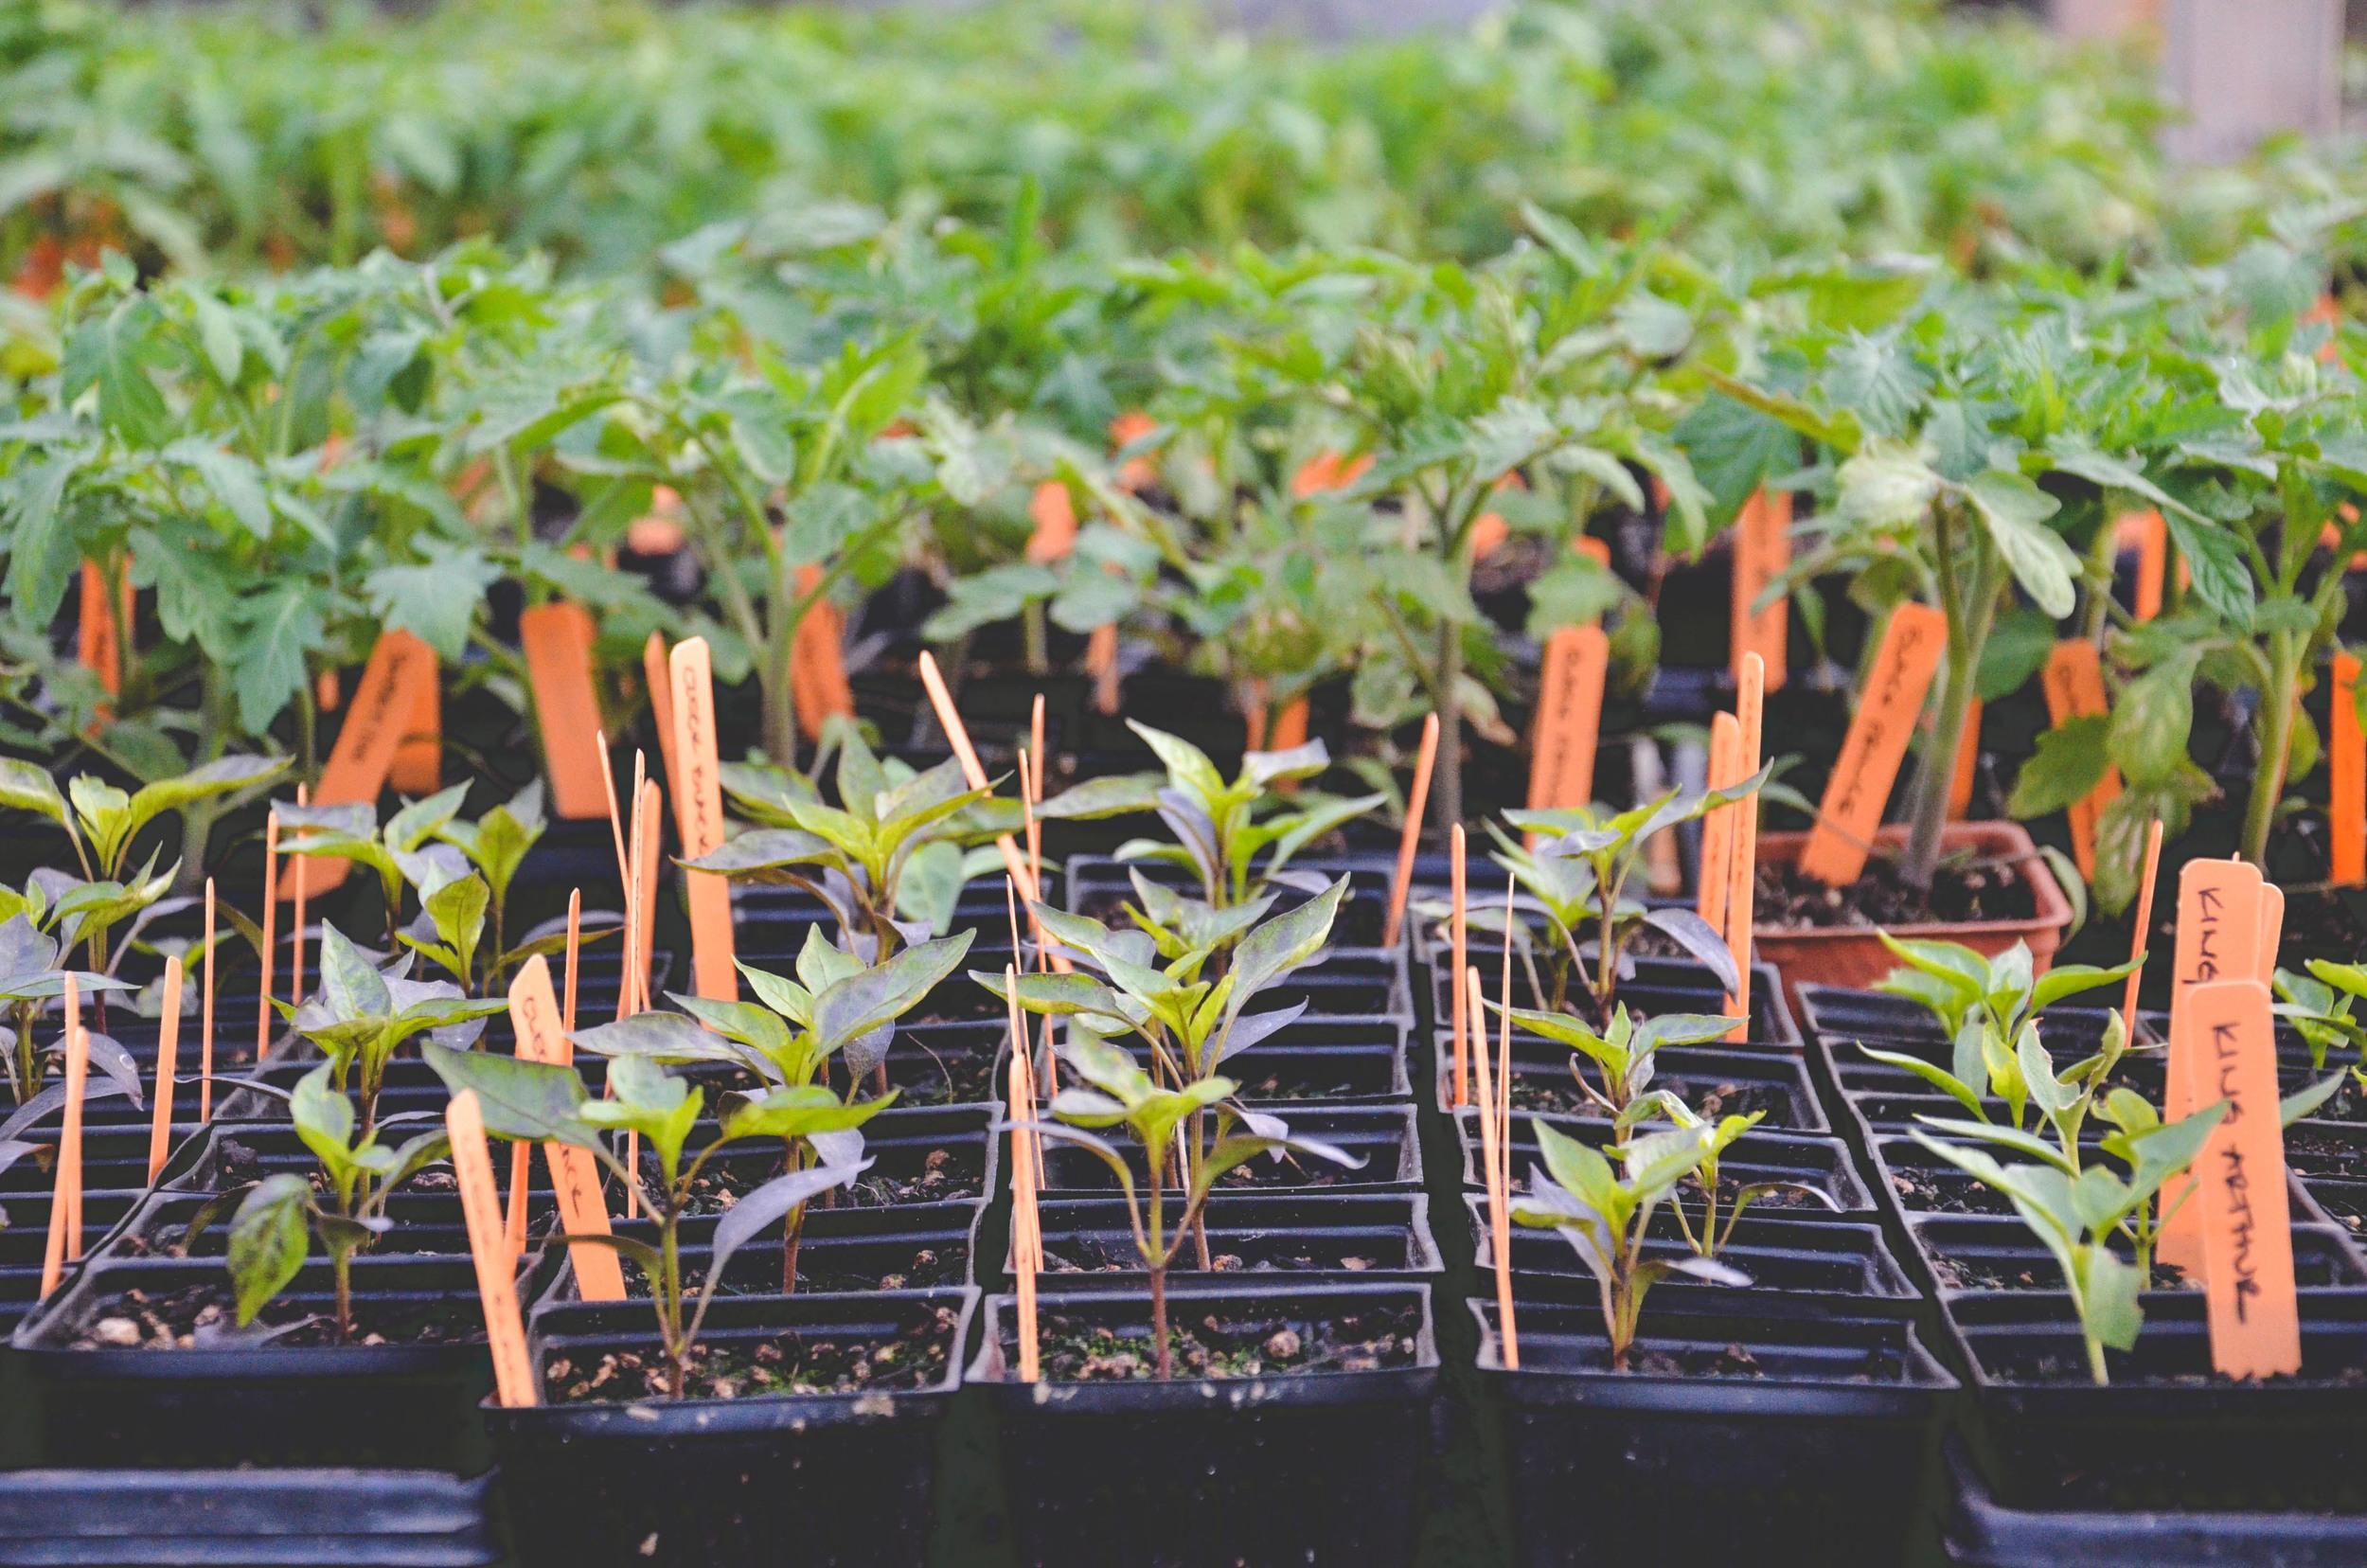 Buying Healthy Vegetable Transplants_Seattle Urban Farm Co.